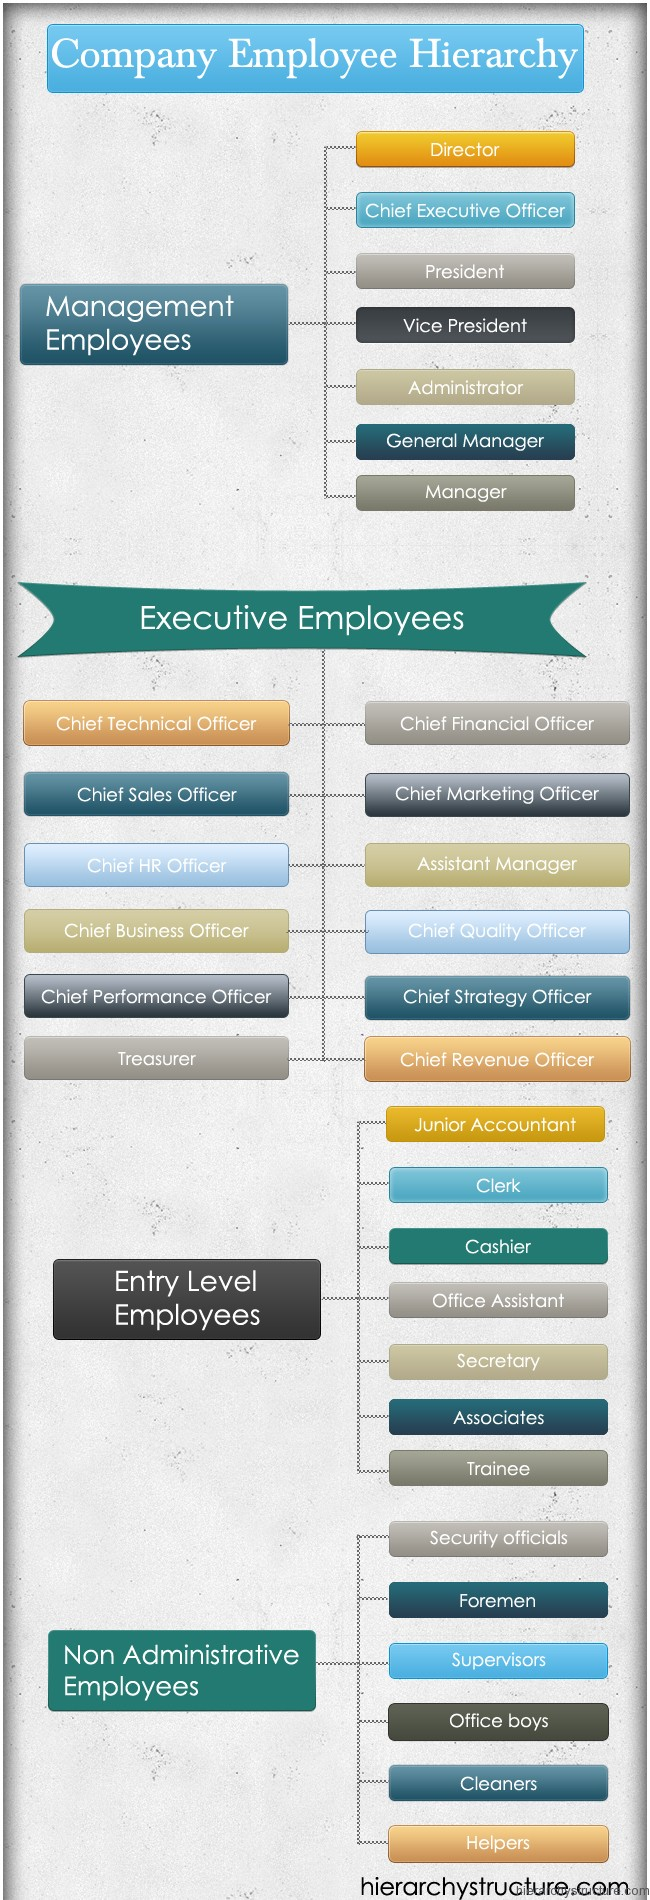 Company Employee Hierarchy